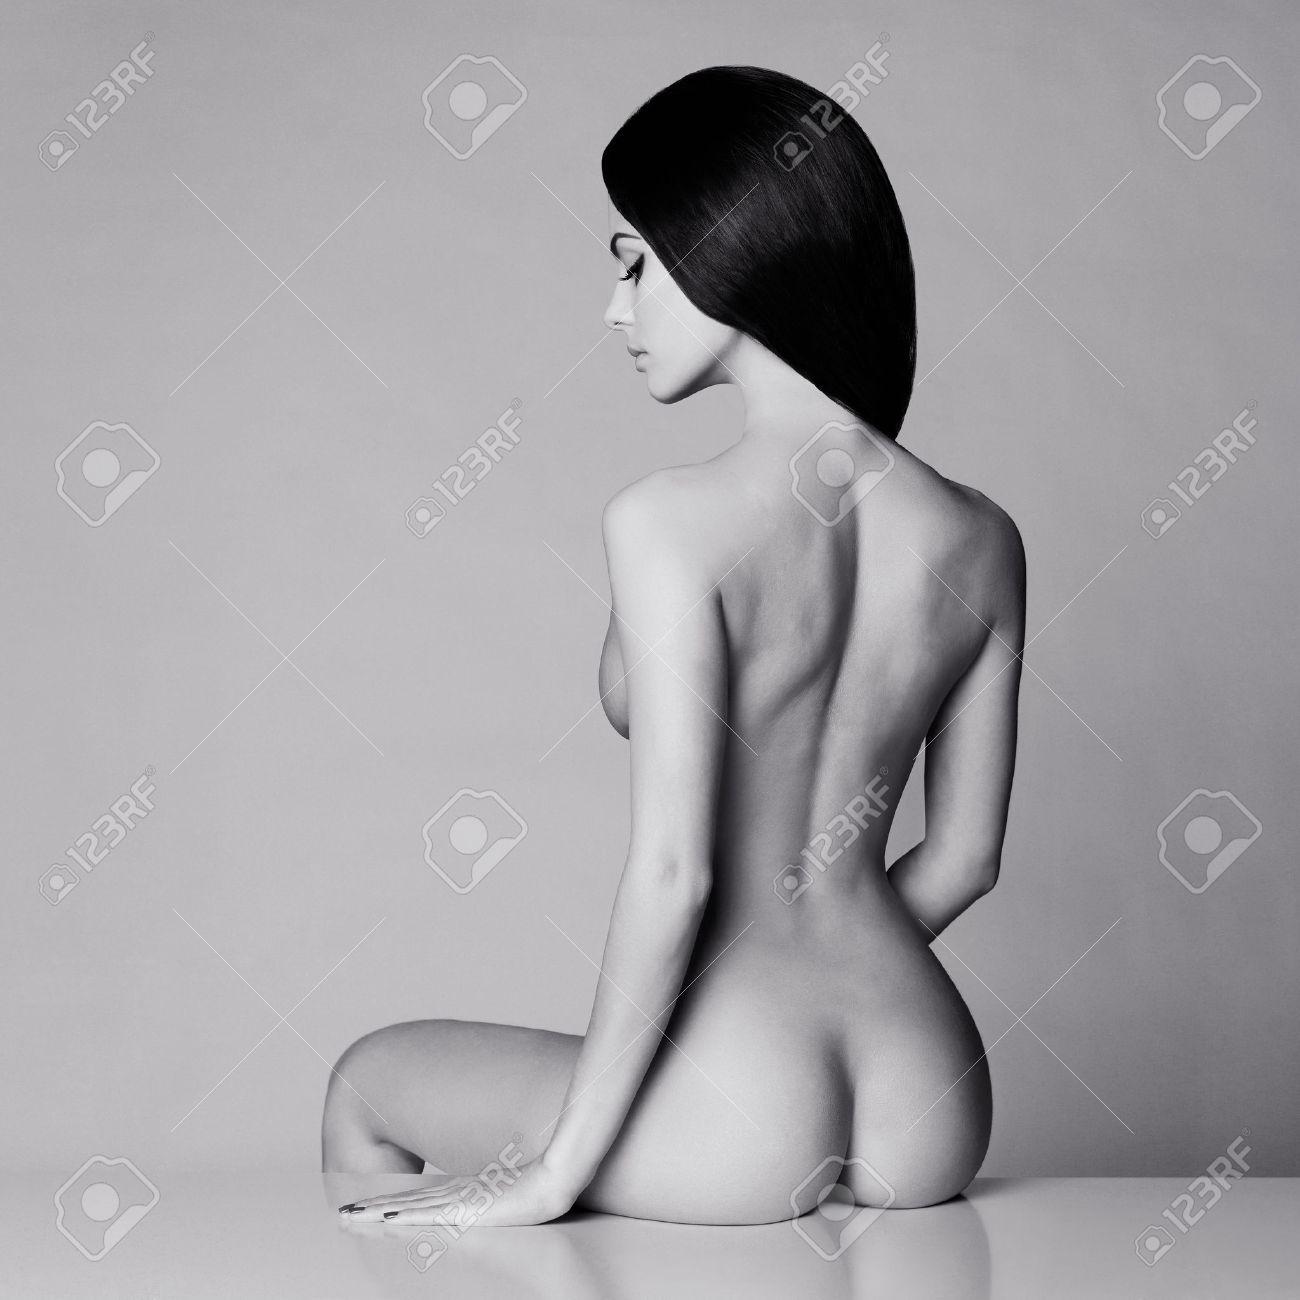 Fashion art studio photo of elegant naked lady Standard-Bild - 40374661